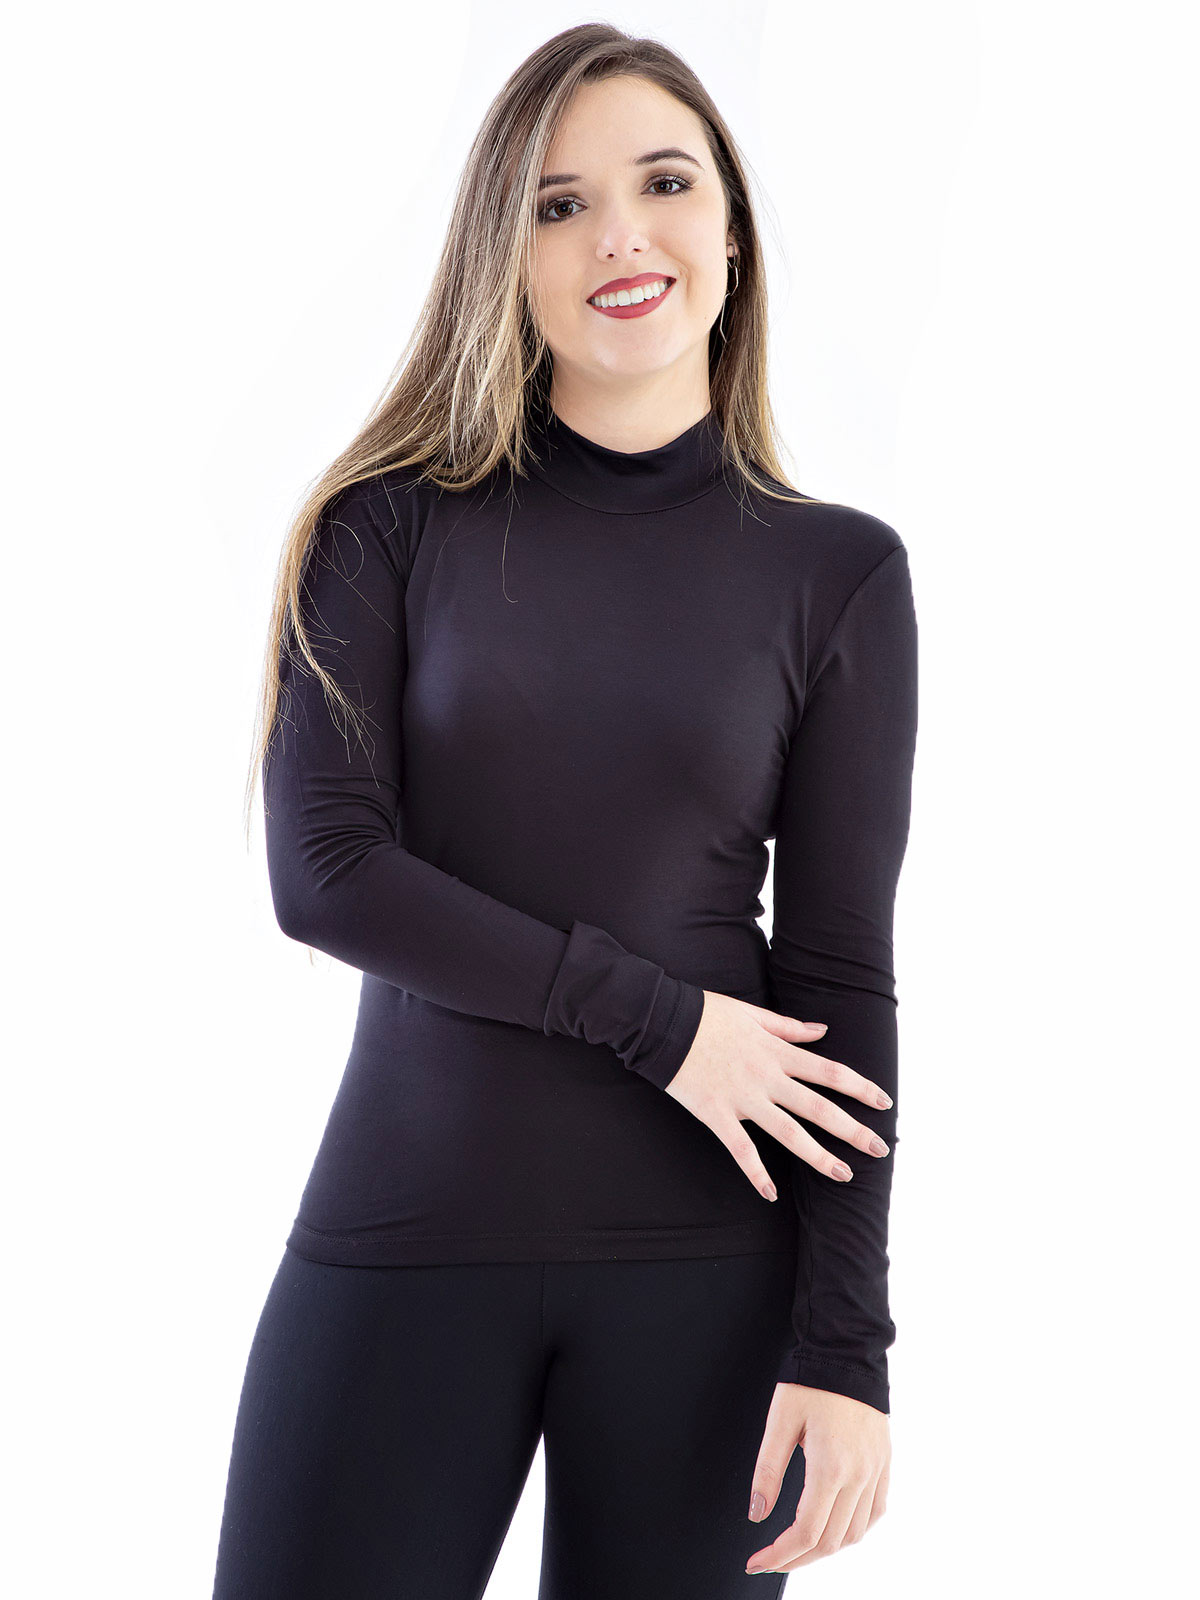 Blusa Gola Alta Feminina De Viscolycra Mangas Longas Preta